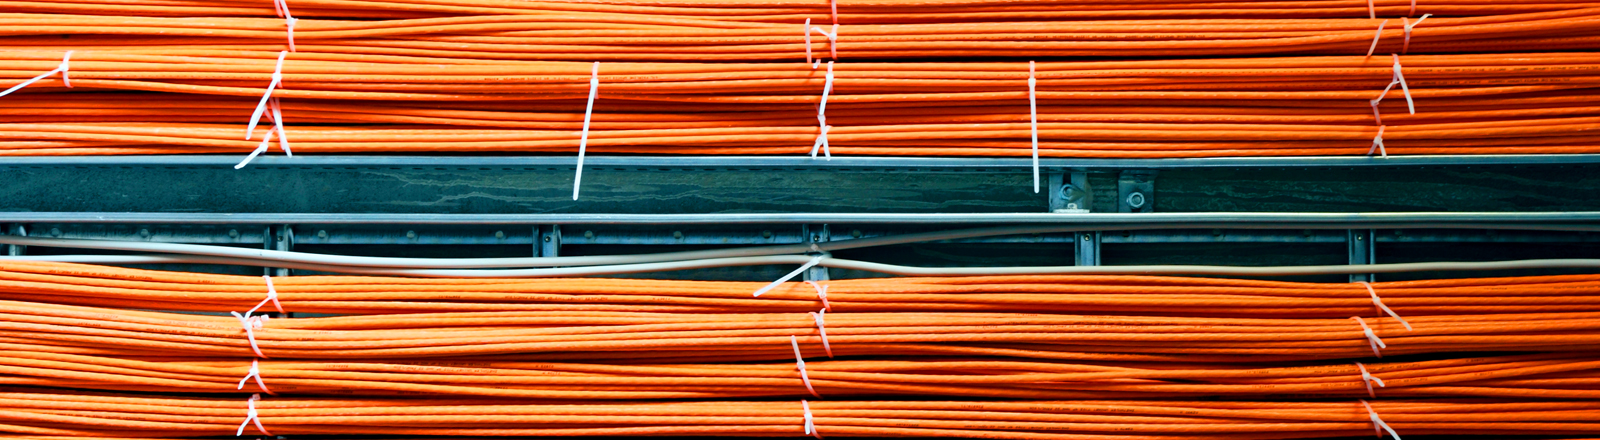 Zwei dicke Kabelstränge